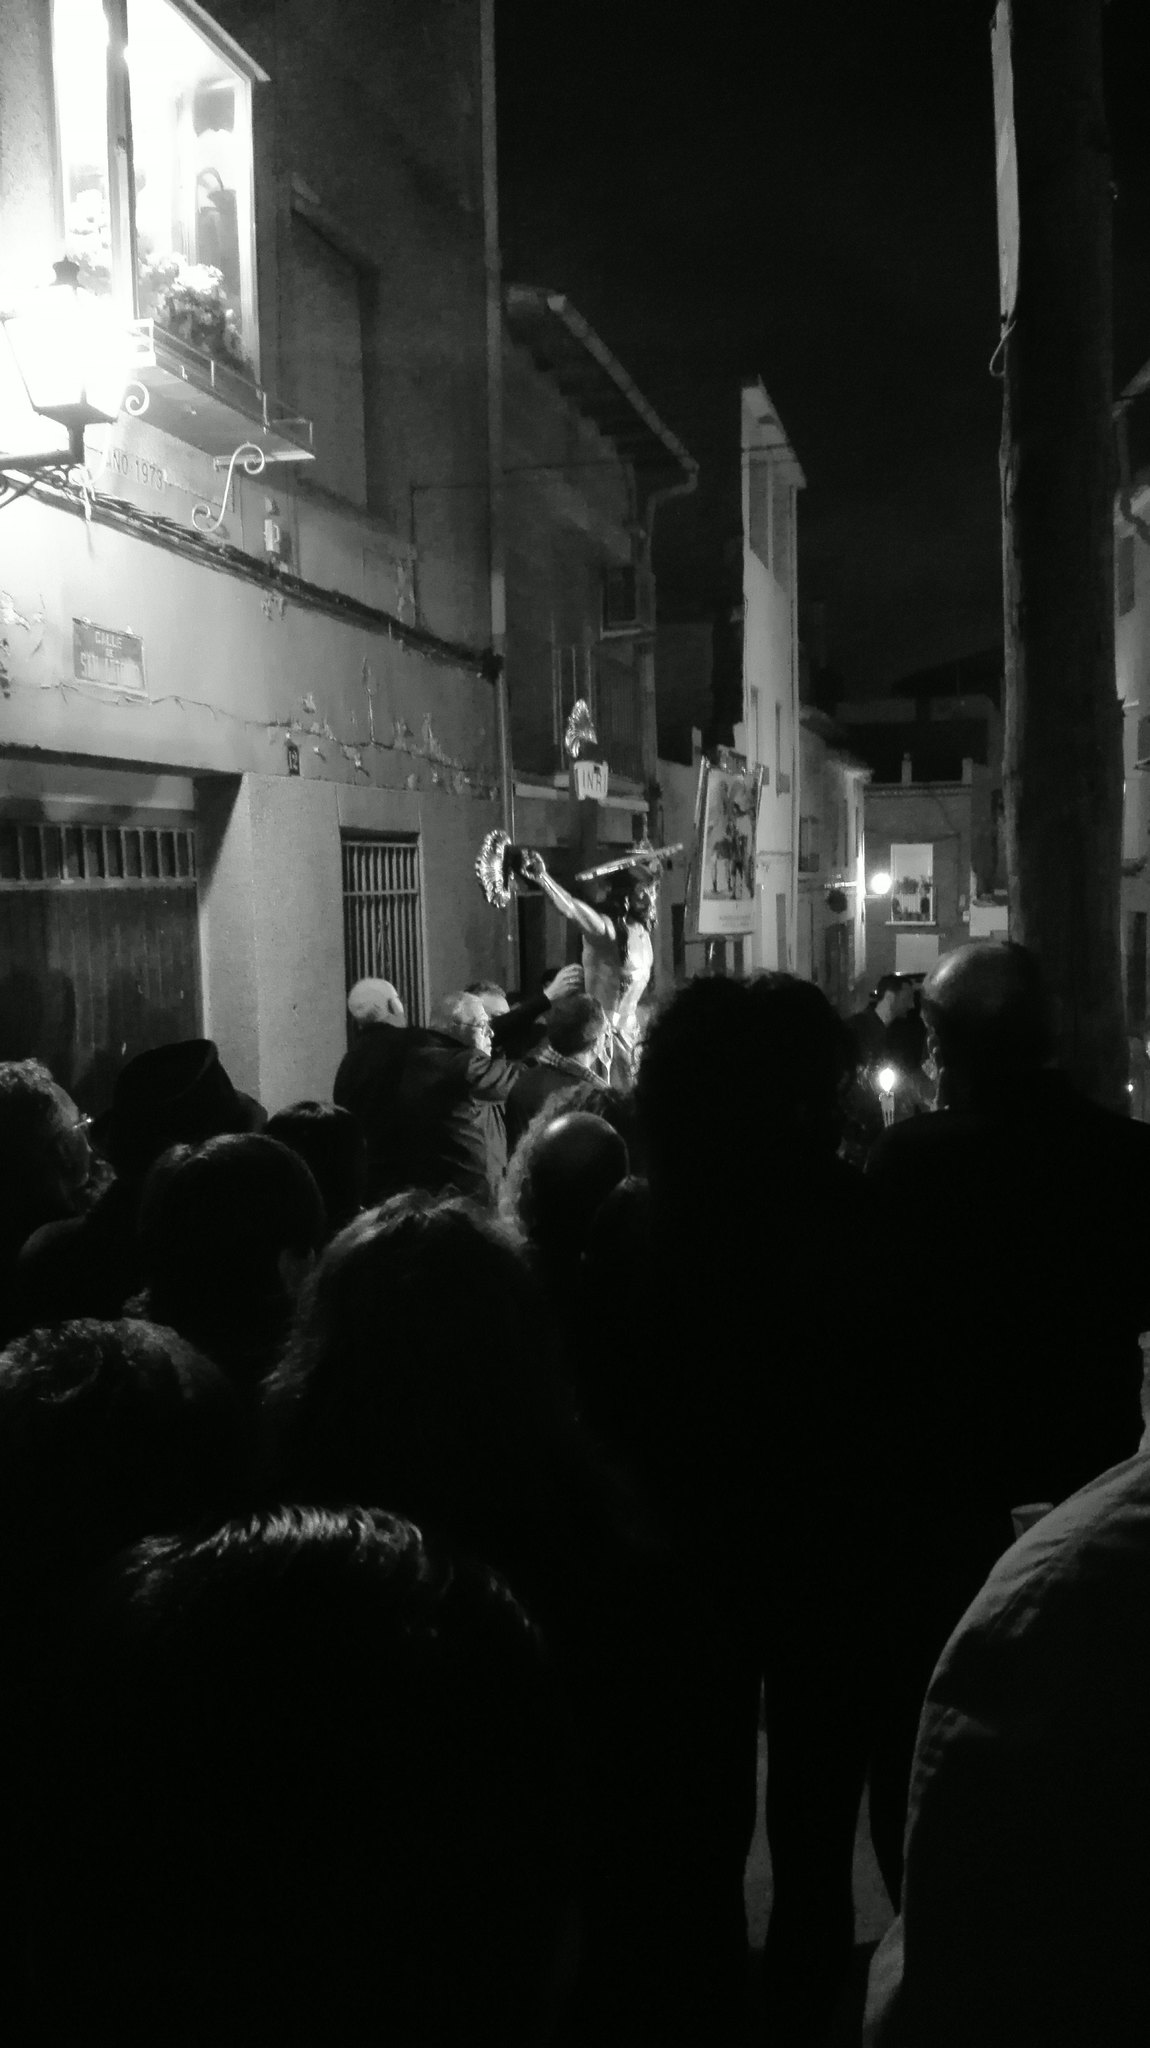 (2016-03-18) - VII Vía Crucis nocturno - Javier Romero Ripoll (012)